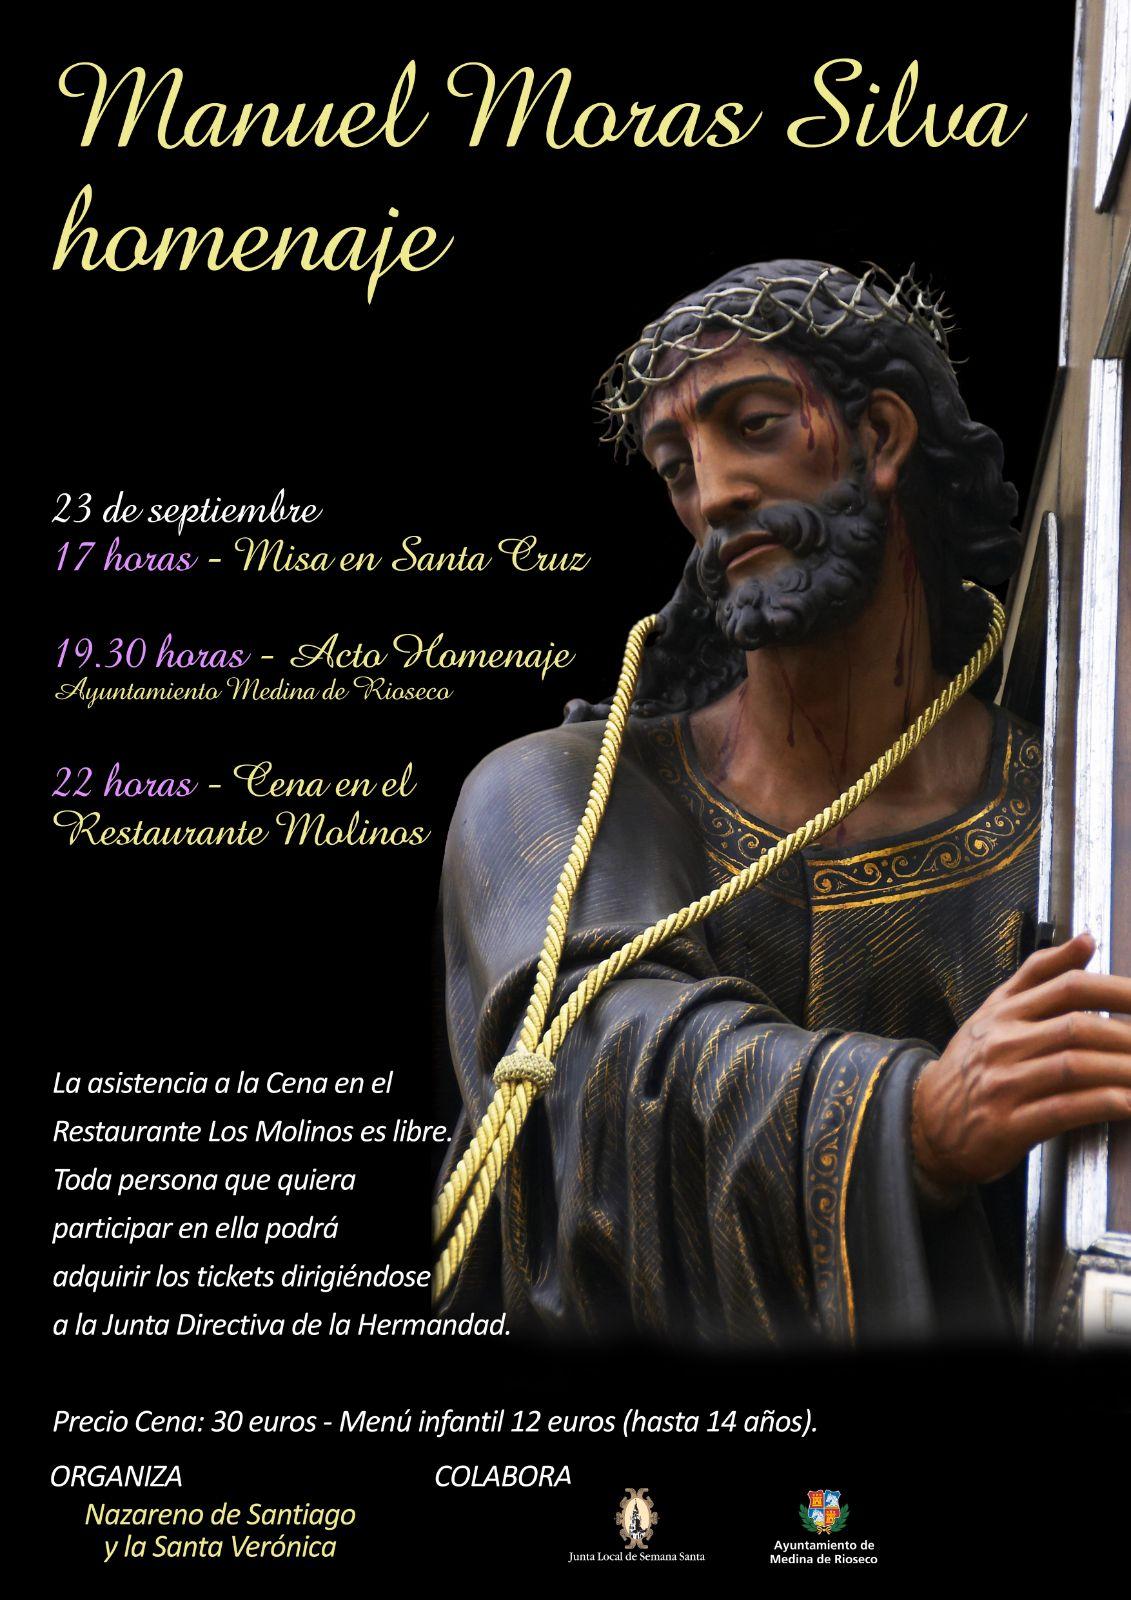 cartel_manuel_moras